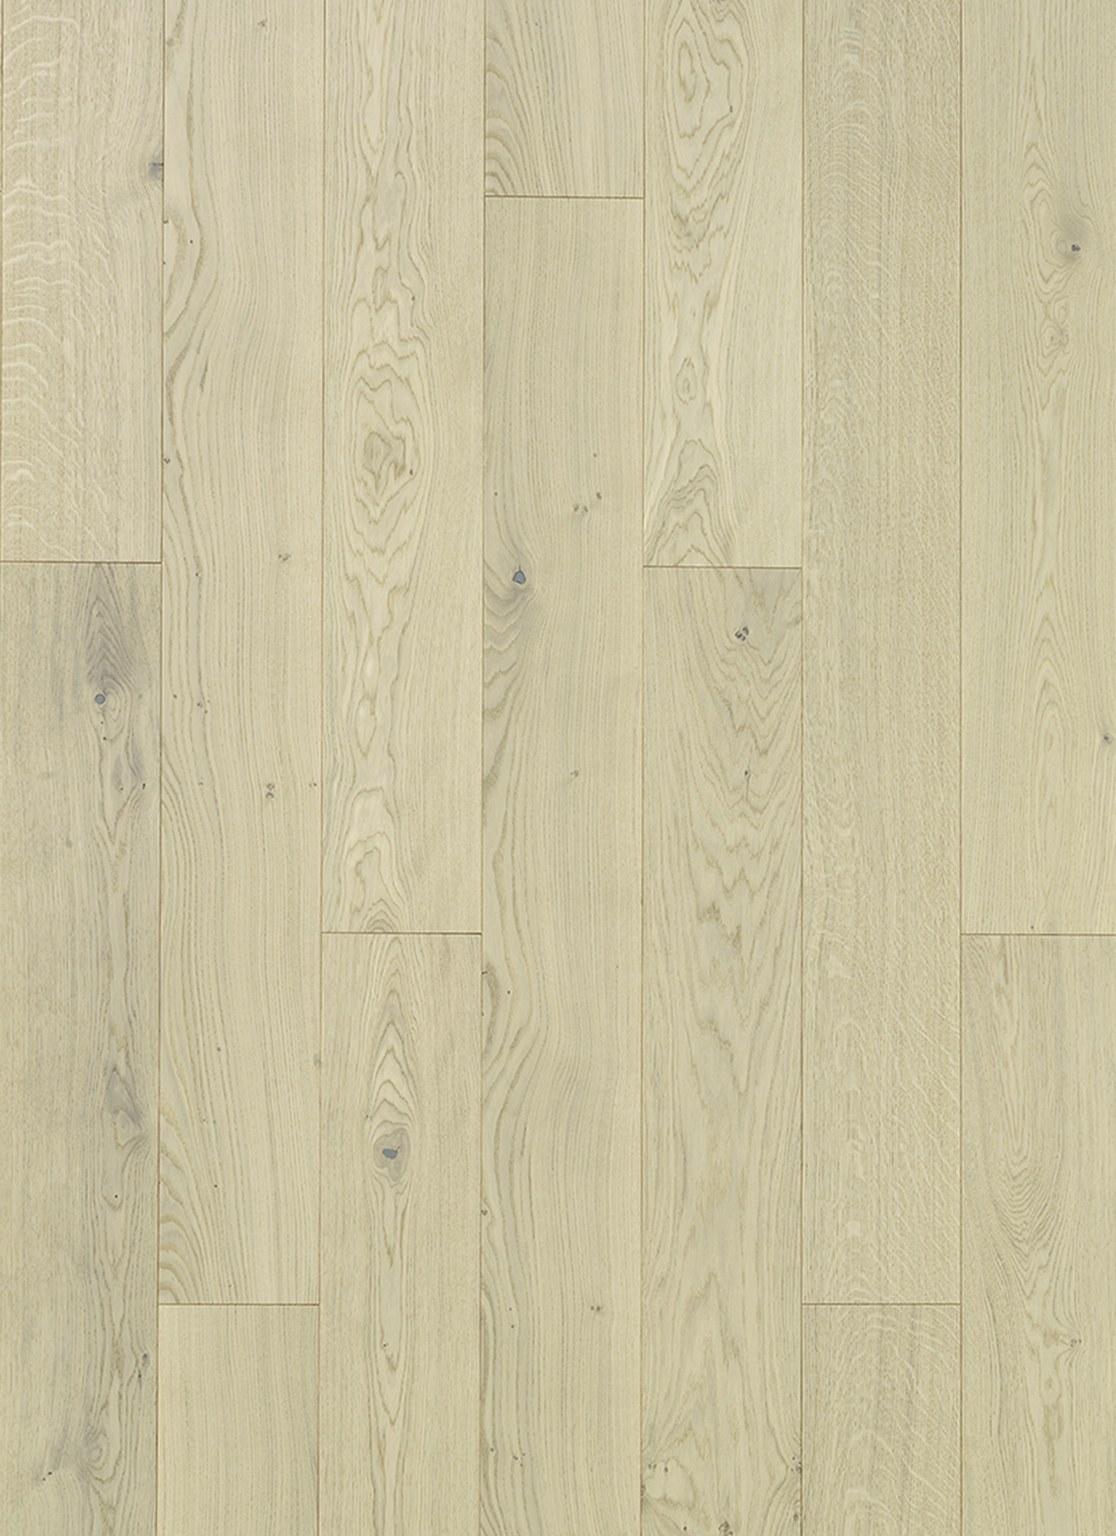 Timberwise-parketti-puulattia-wooden-floor-parquet-Tammi-Oak-valkomattalakattu-white matte lacquered